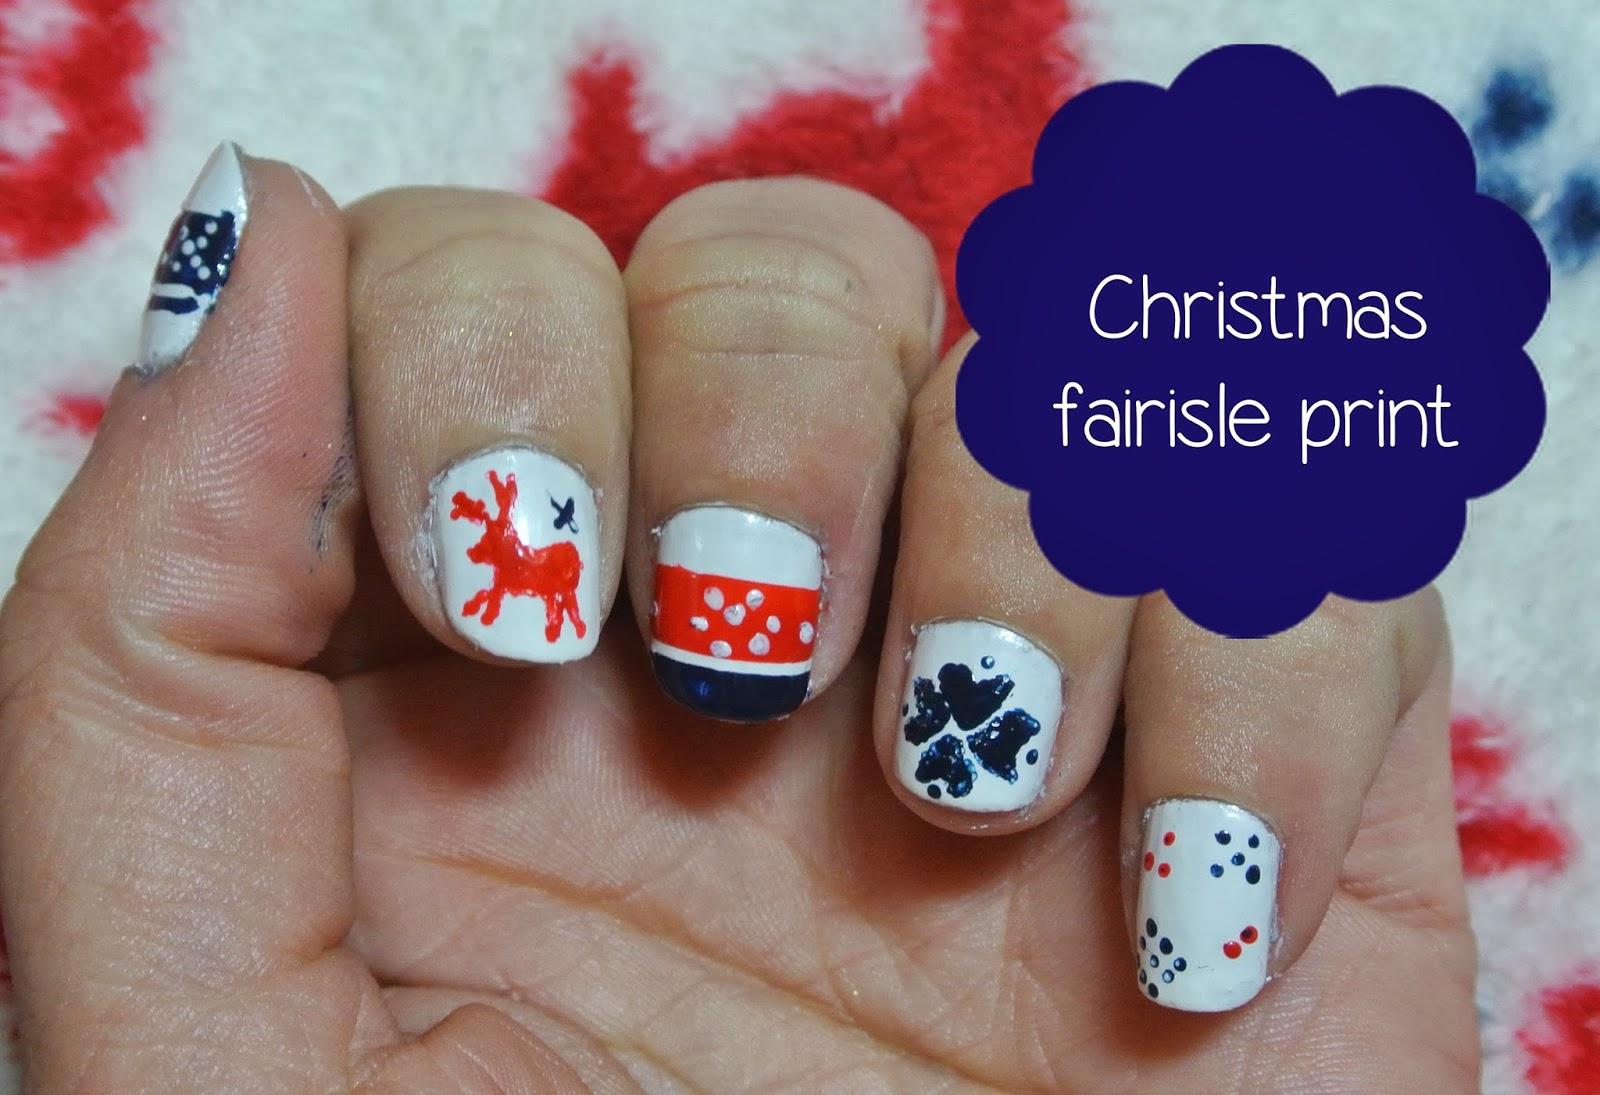 sunday nails #47 - christmas fairisle print • The Mini Mermaid